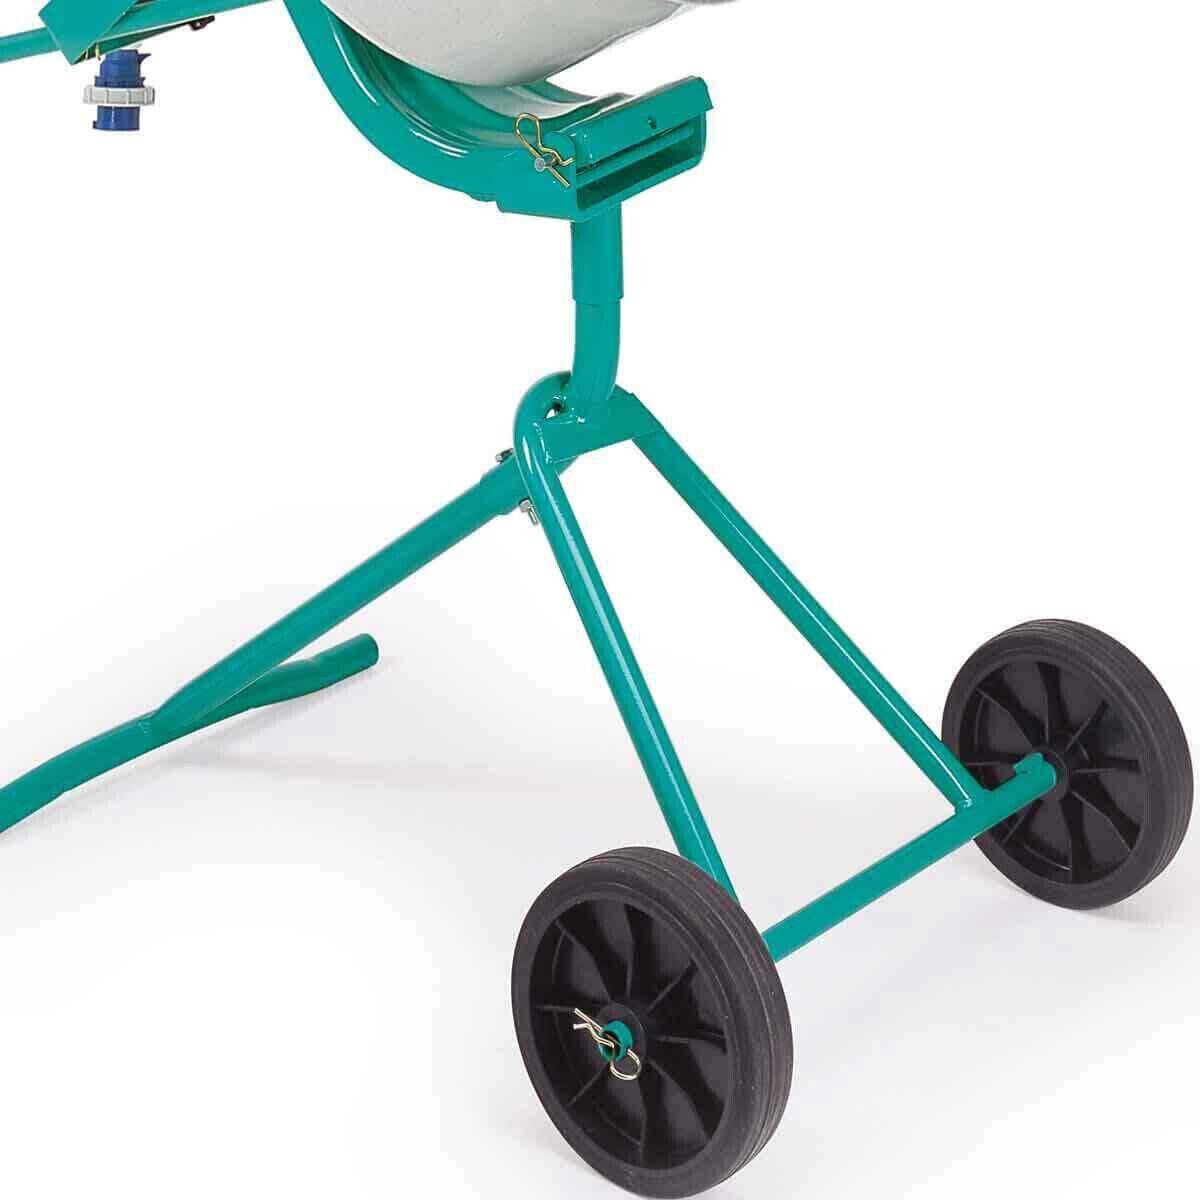 Imer Portable Cement Mixer Wheels